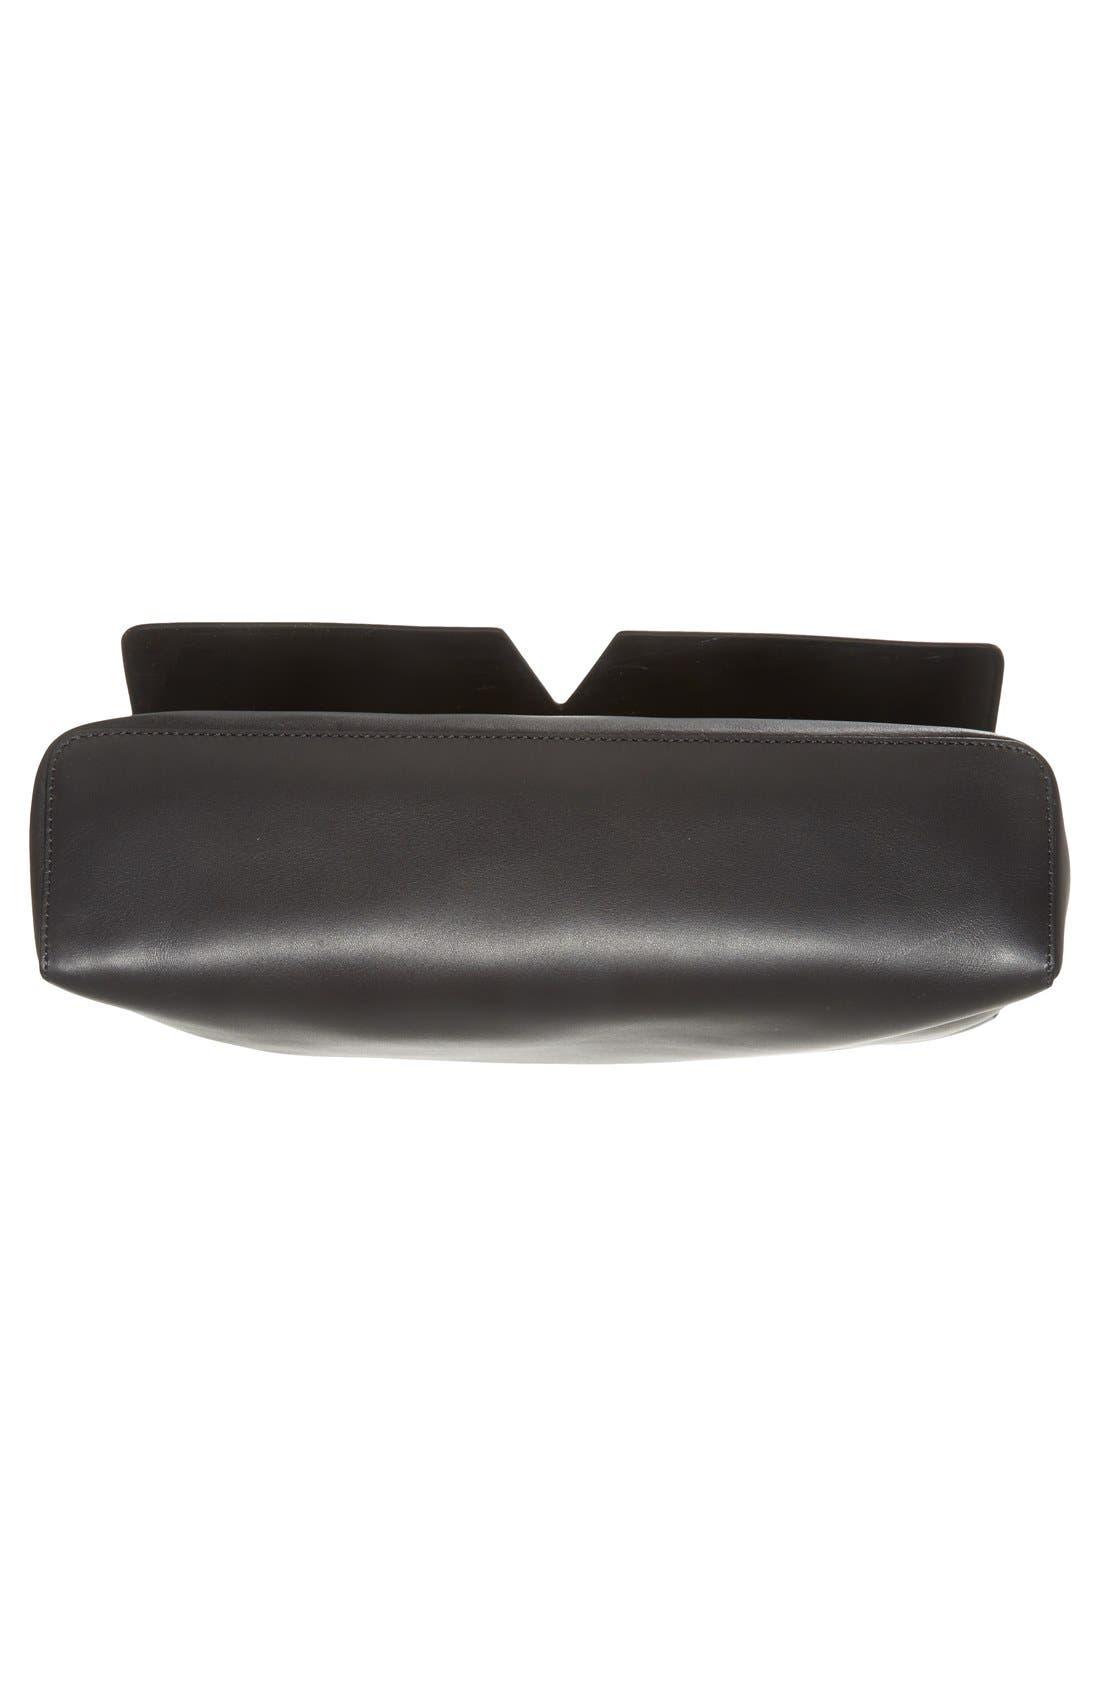 'Signature Collection - Medium' Leather Messenger Bag,                             Alternate thumbnail 6, color,                             001